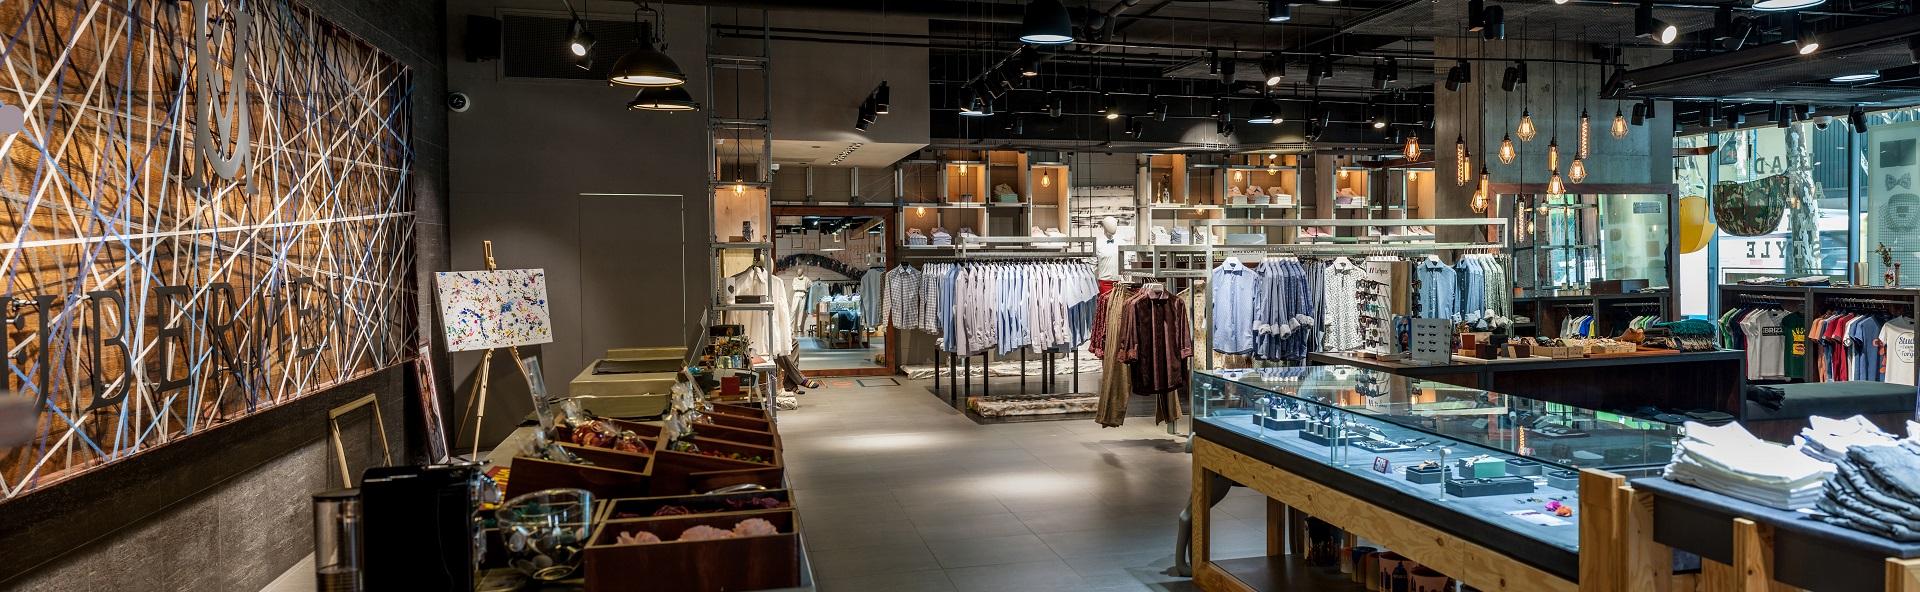 UBERMEN store 1-1